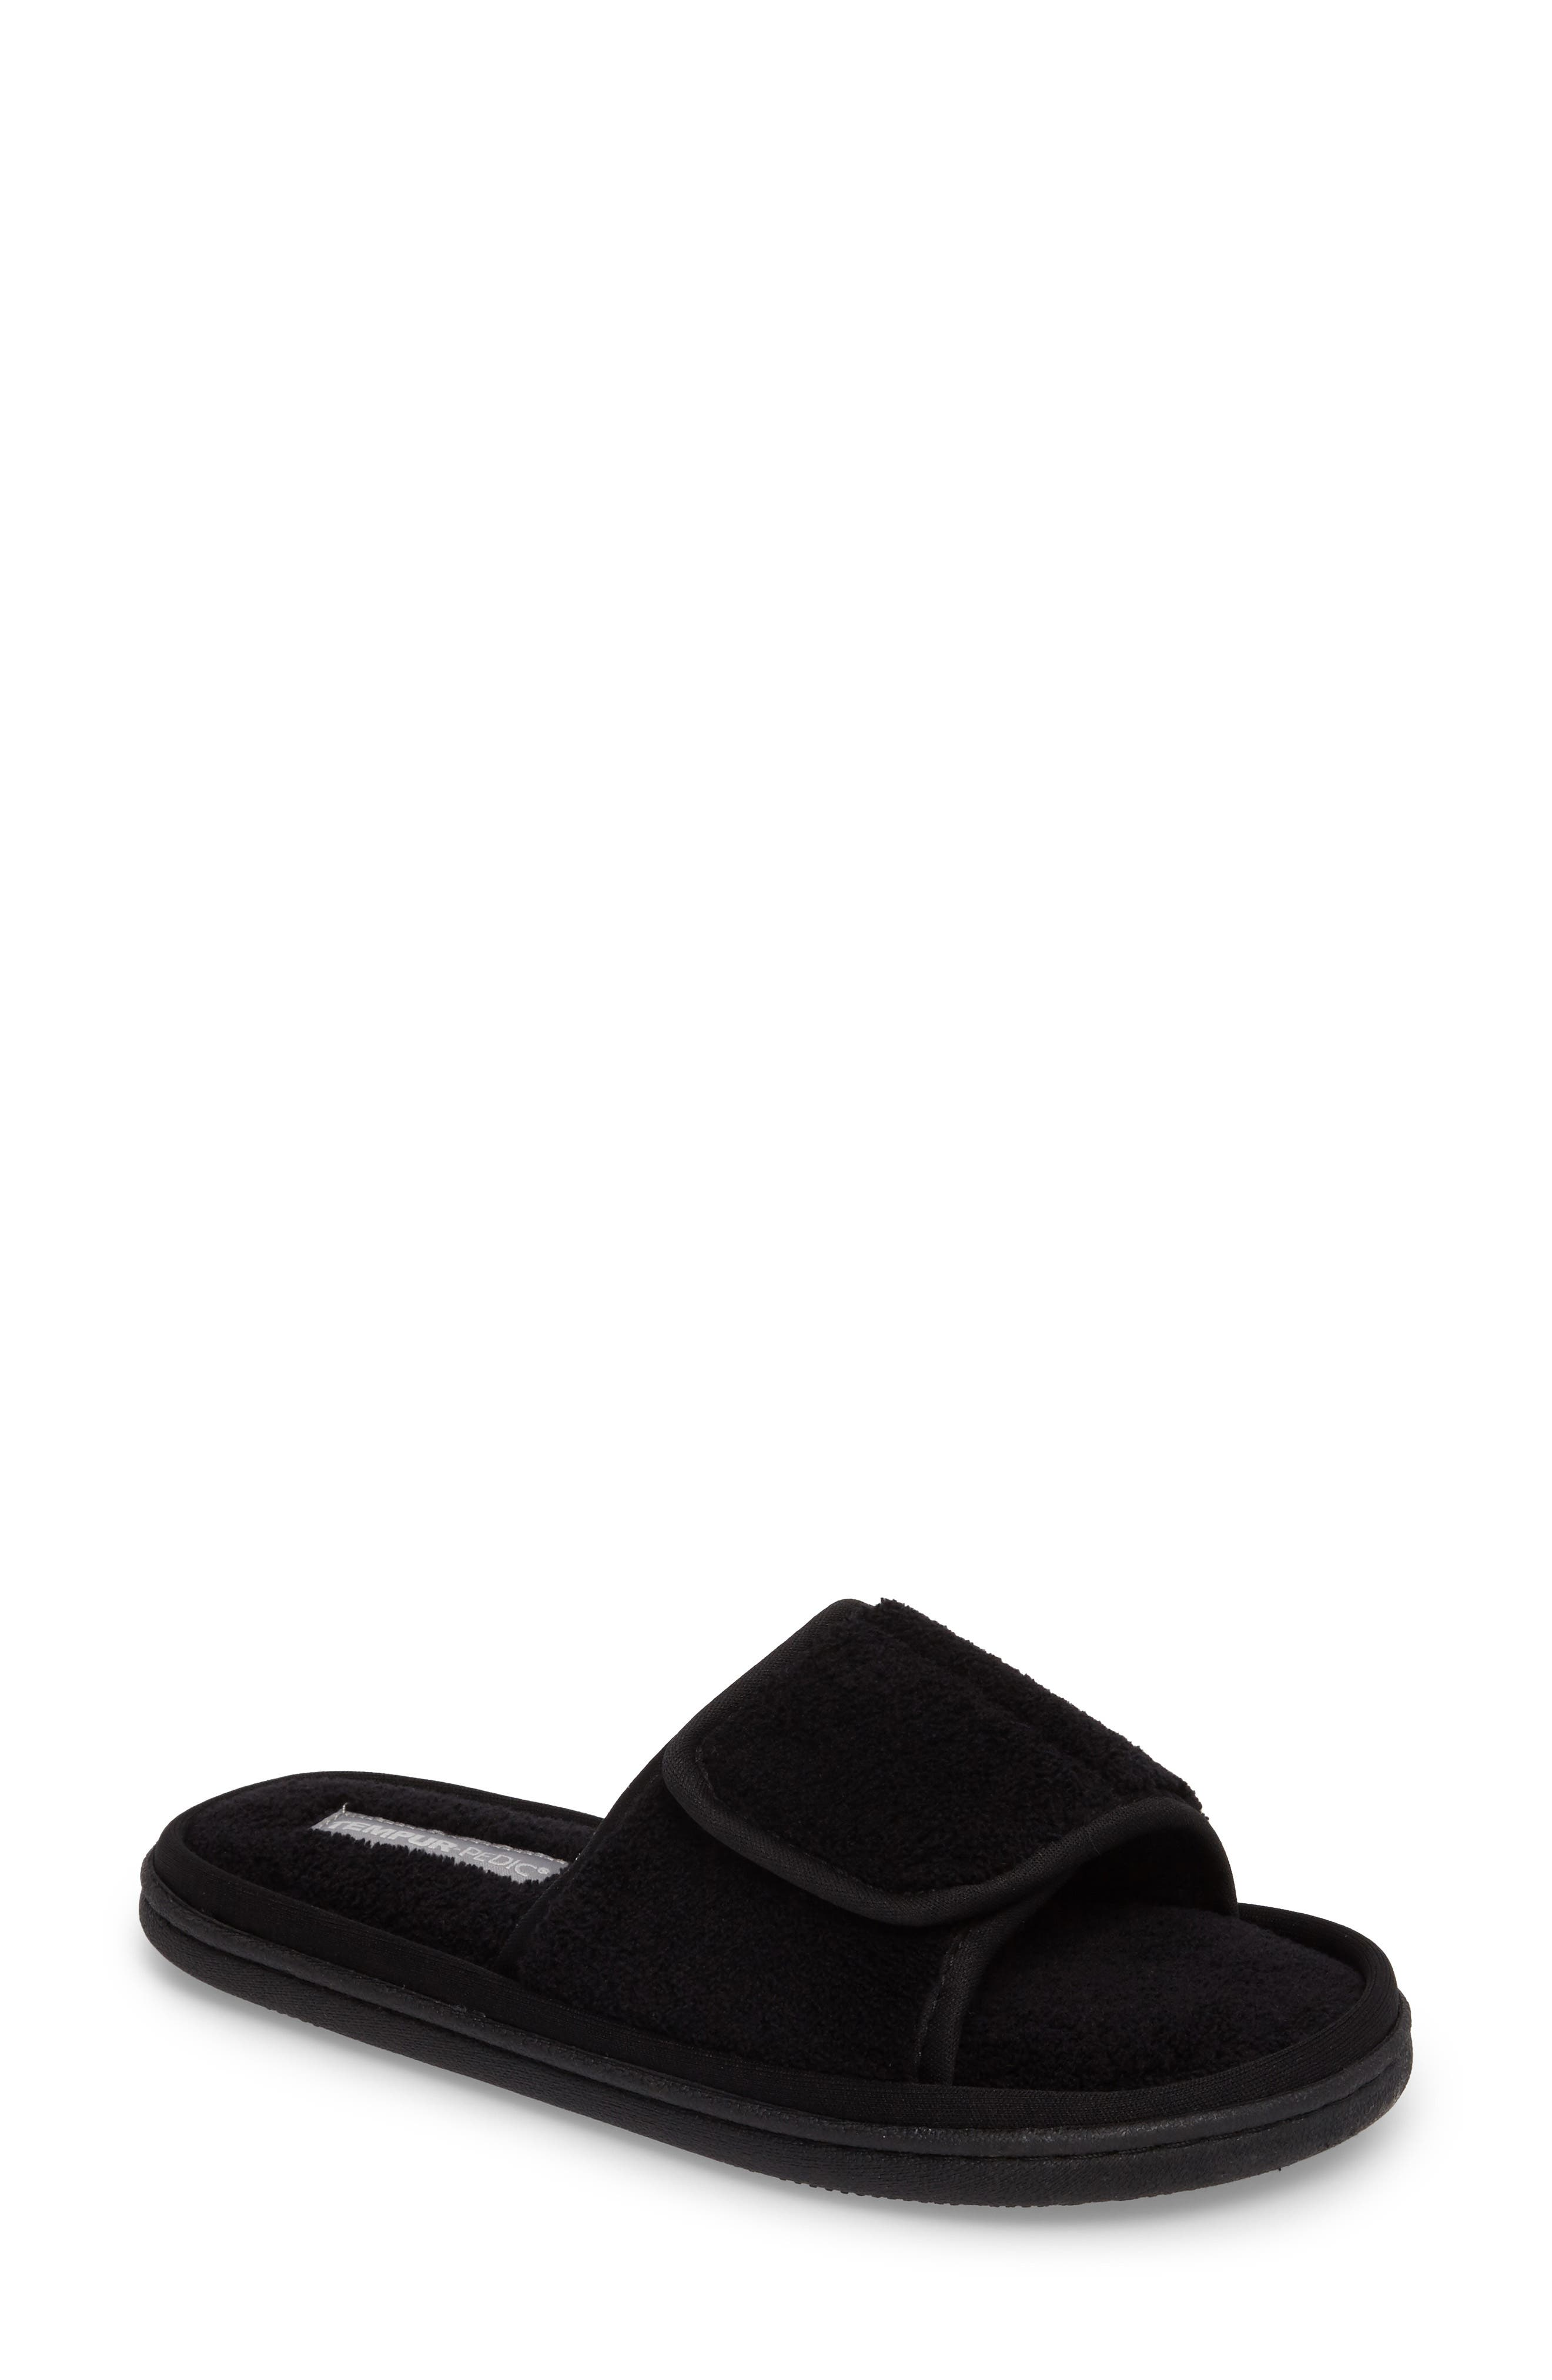 Geana Slipper,                         Main,                         color, BLACK FABRIC